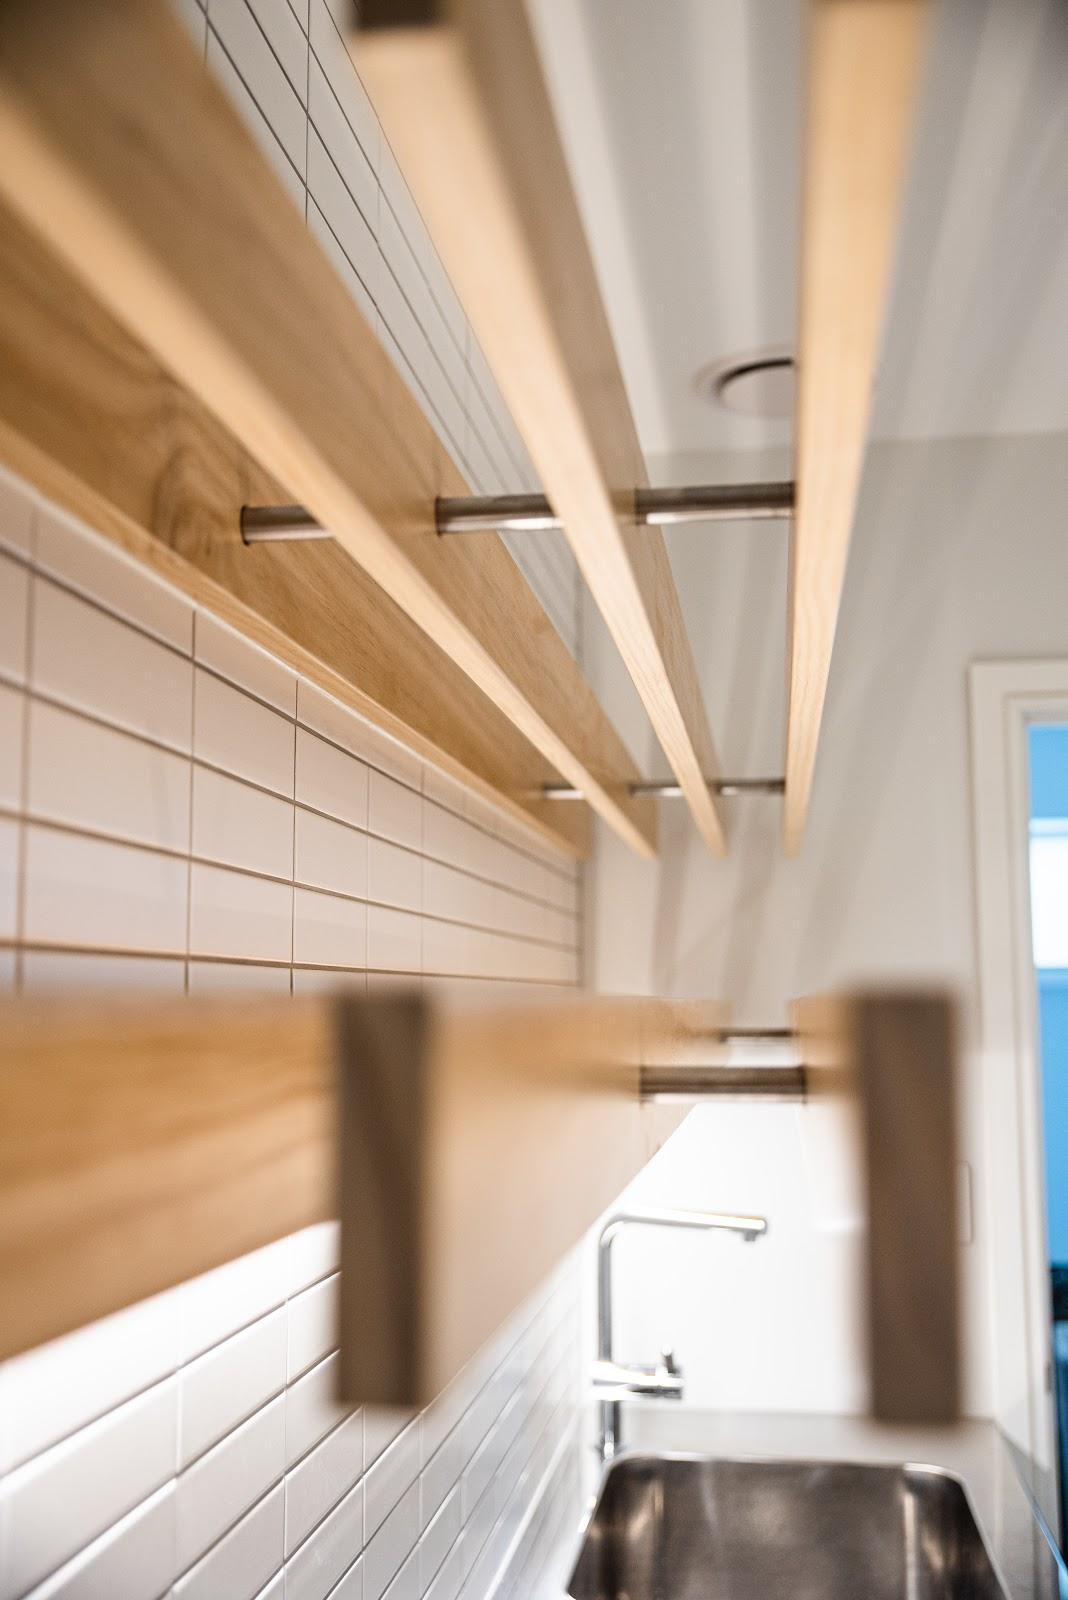 laundry wooden rails